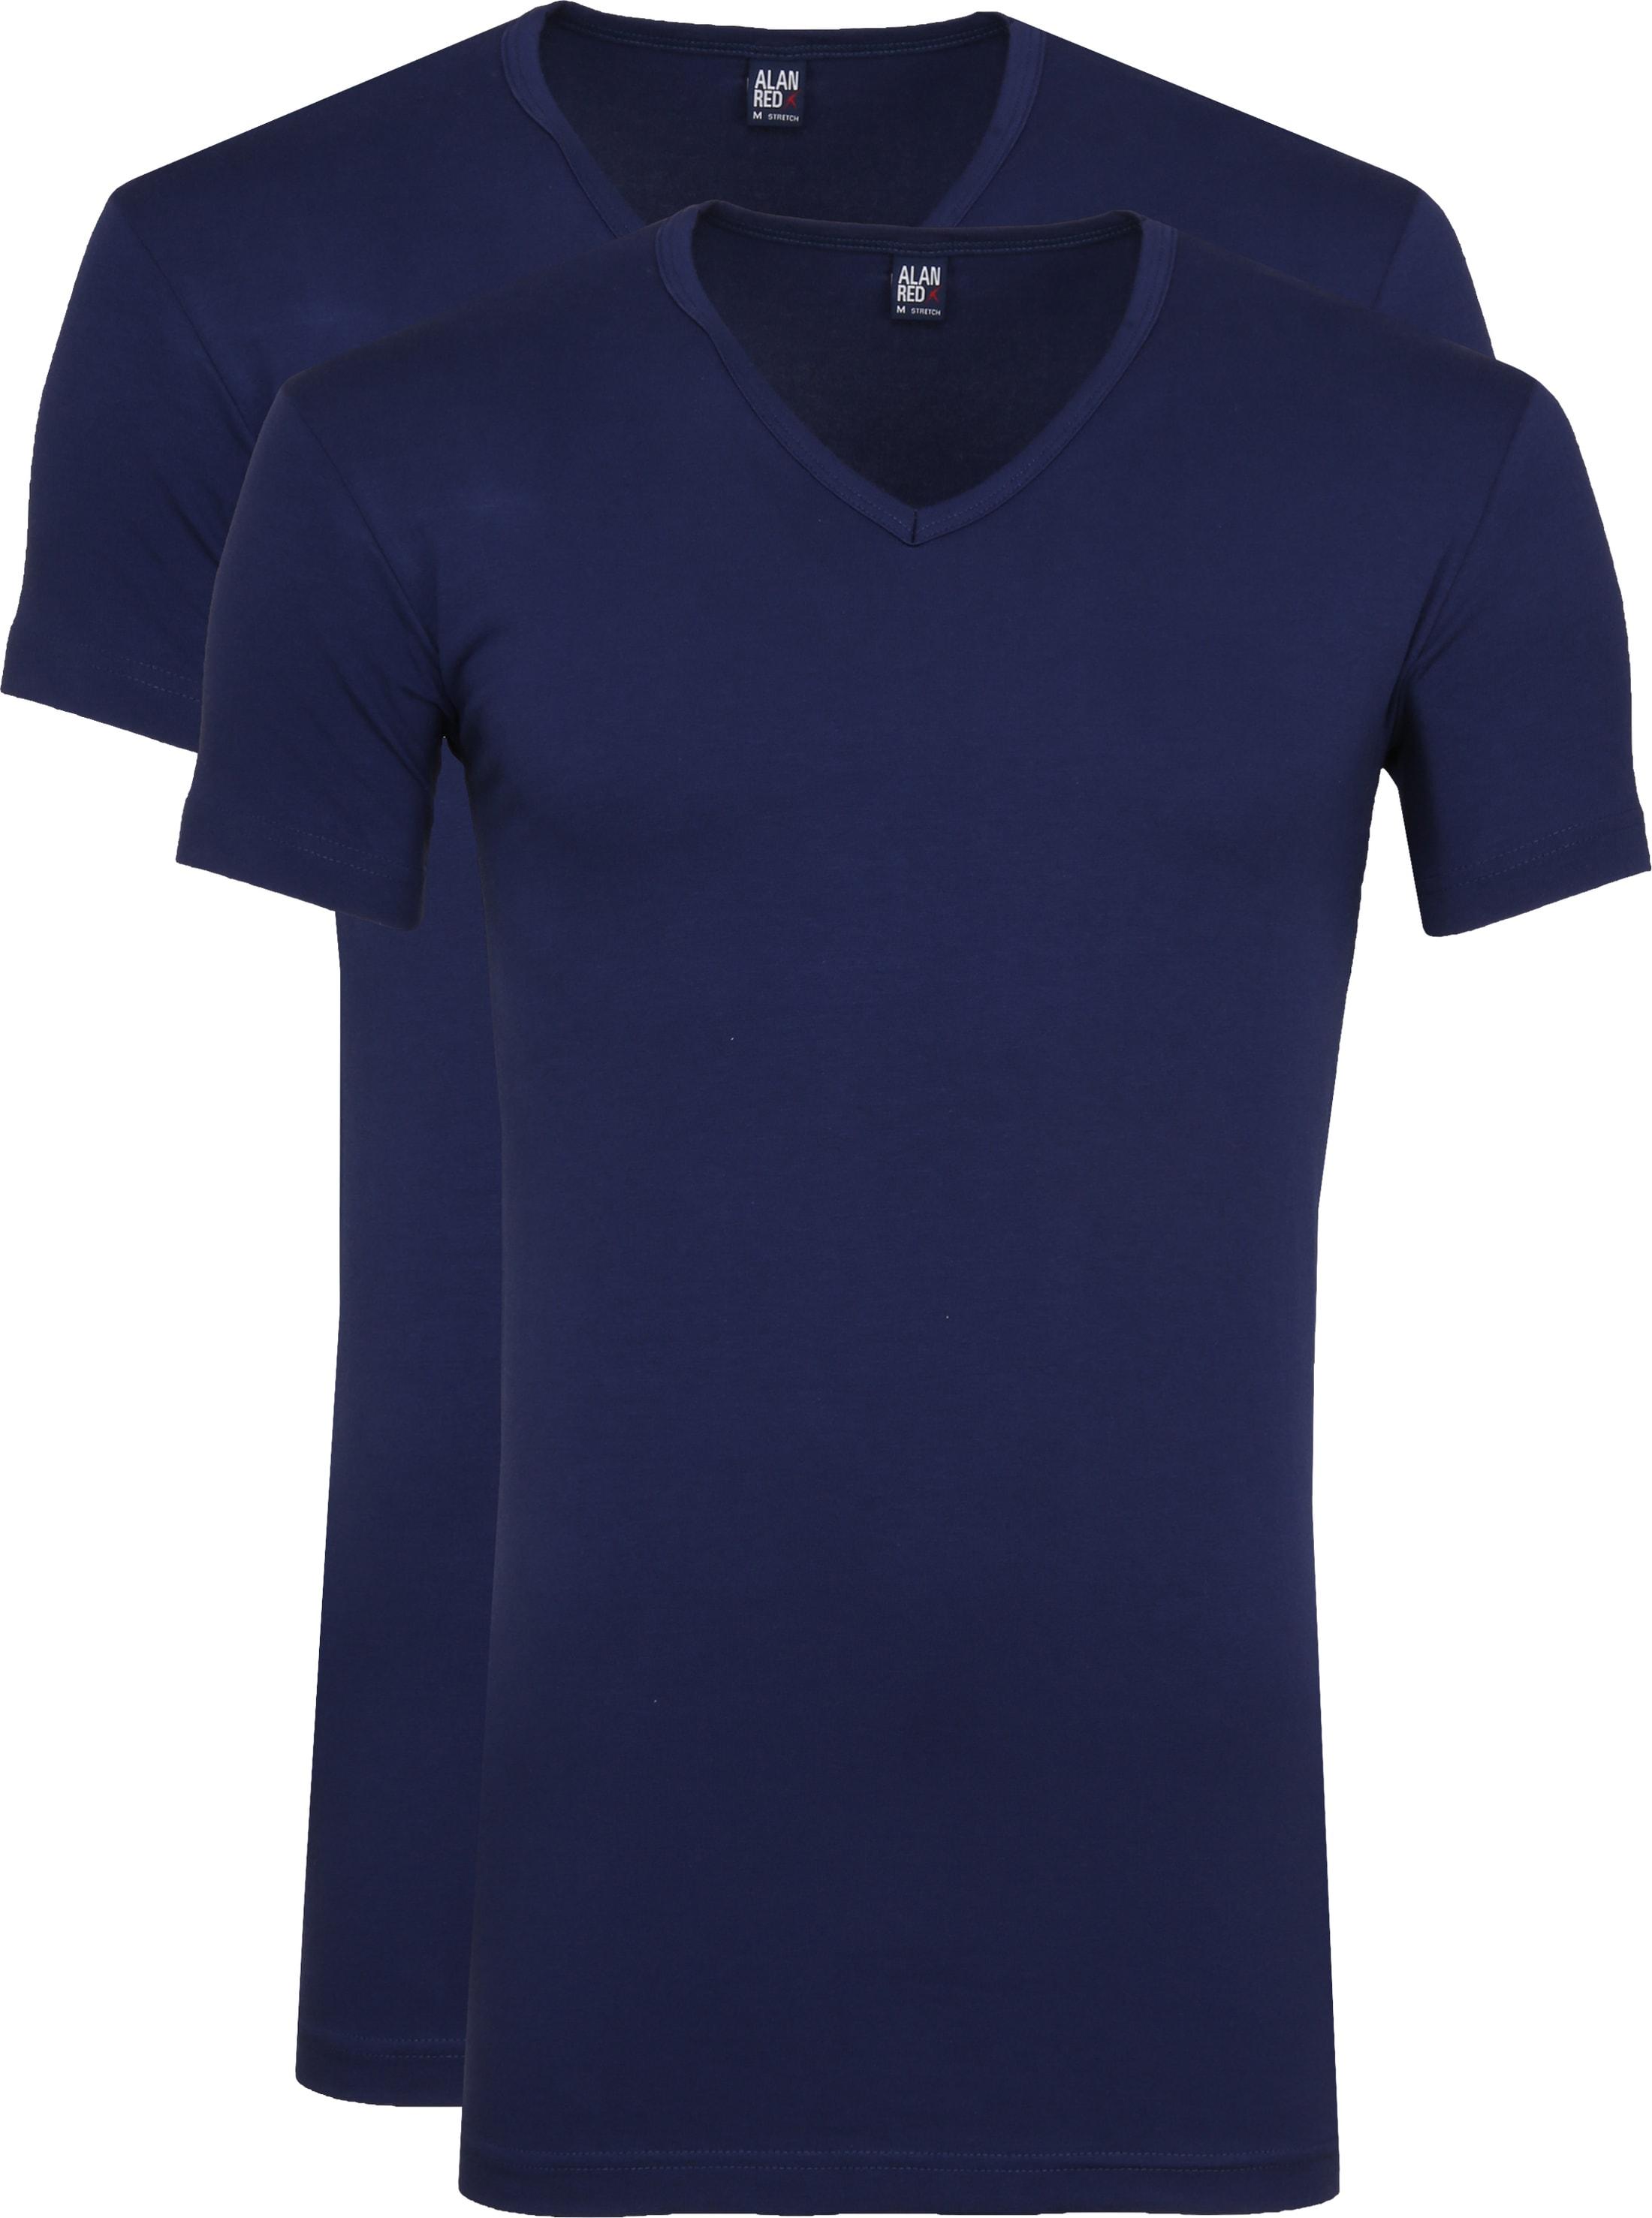 Alan Red Oklahoma V-Hals T-Shirt Blauw Stretch (2Pack) foto 0